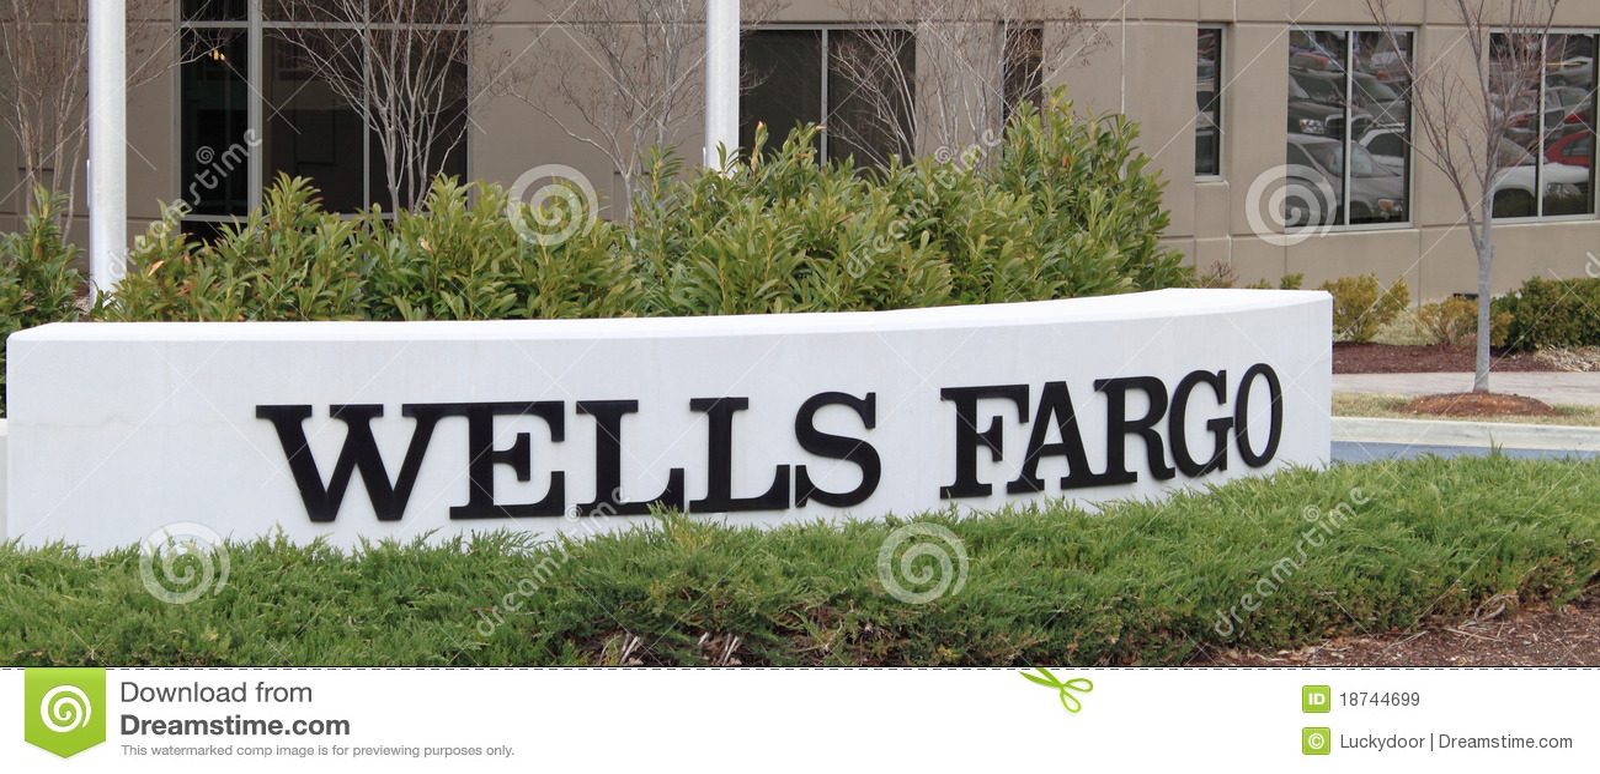 wells fargo bank sign editorial stock image image 18744699. Black Bedroom Furniture Sets. Home Design Ideas